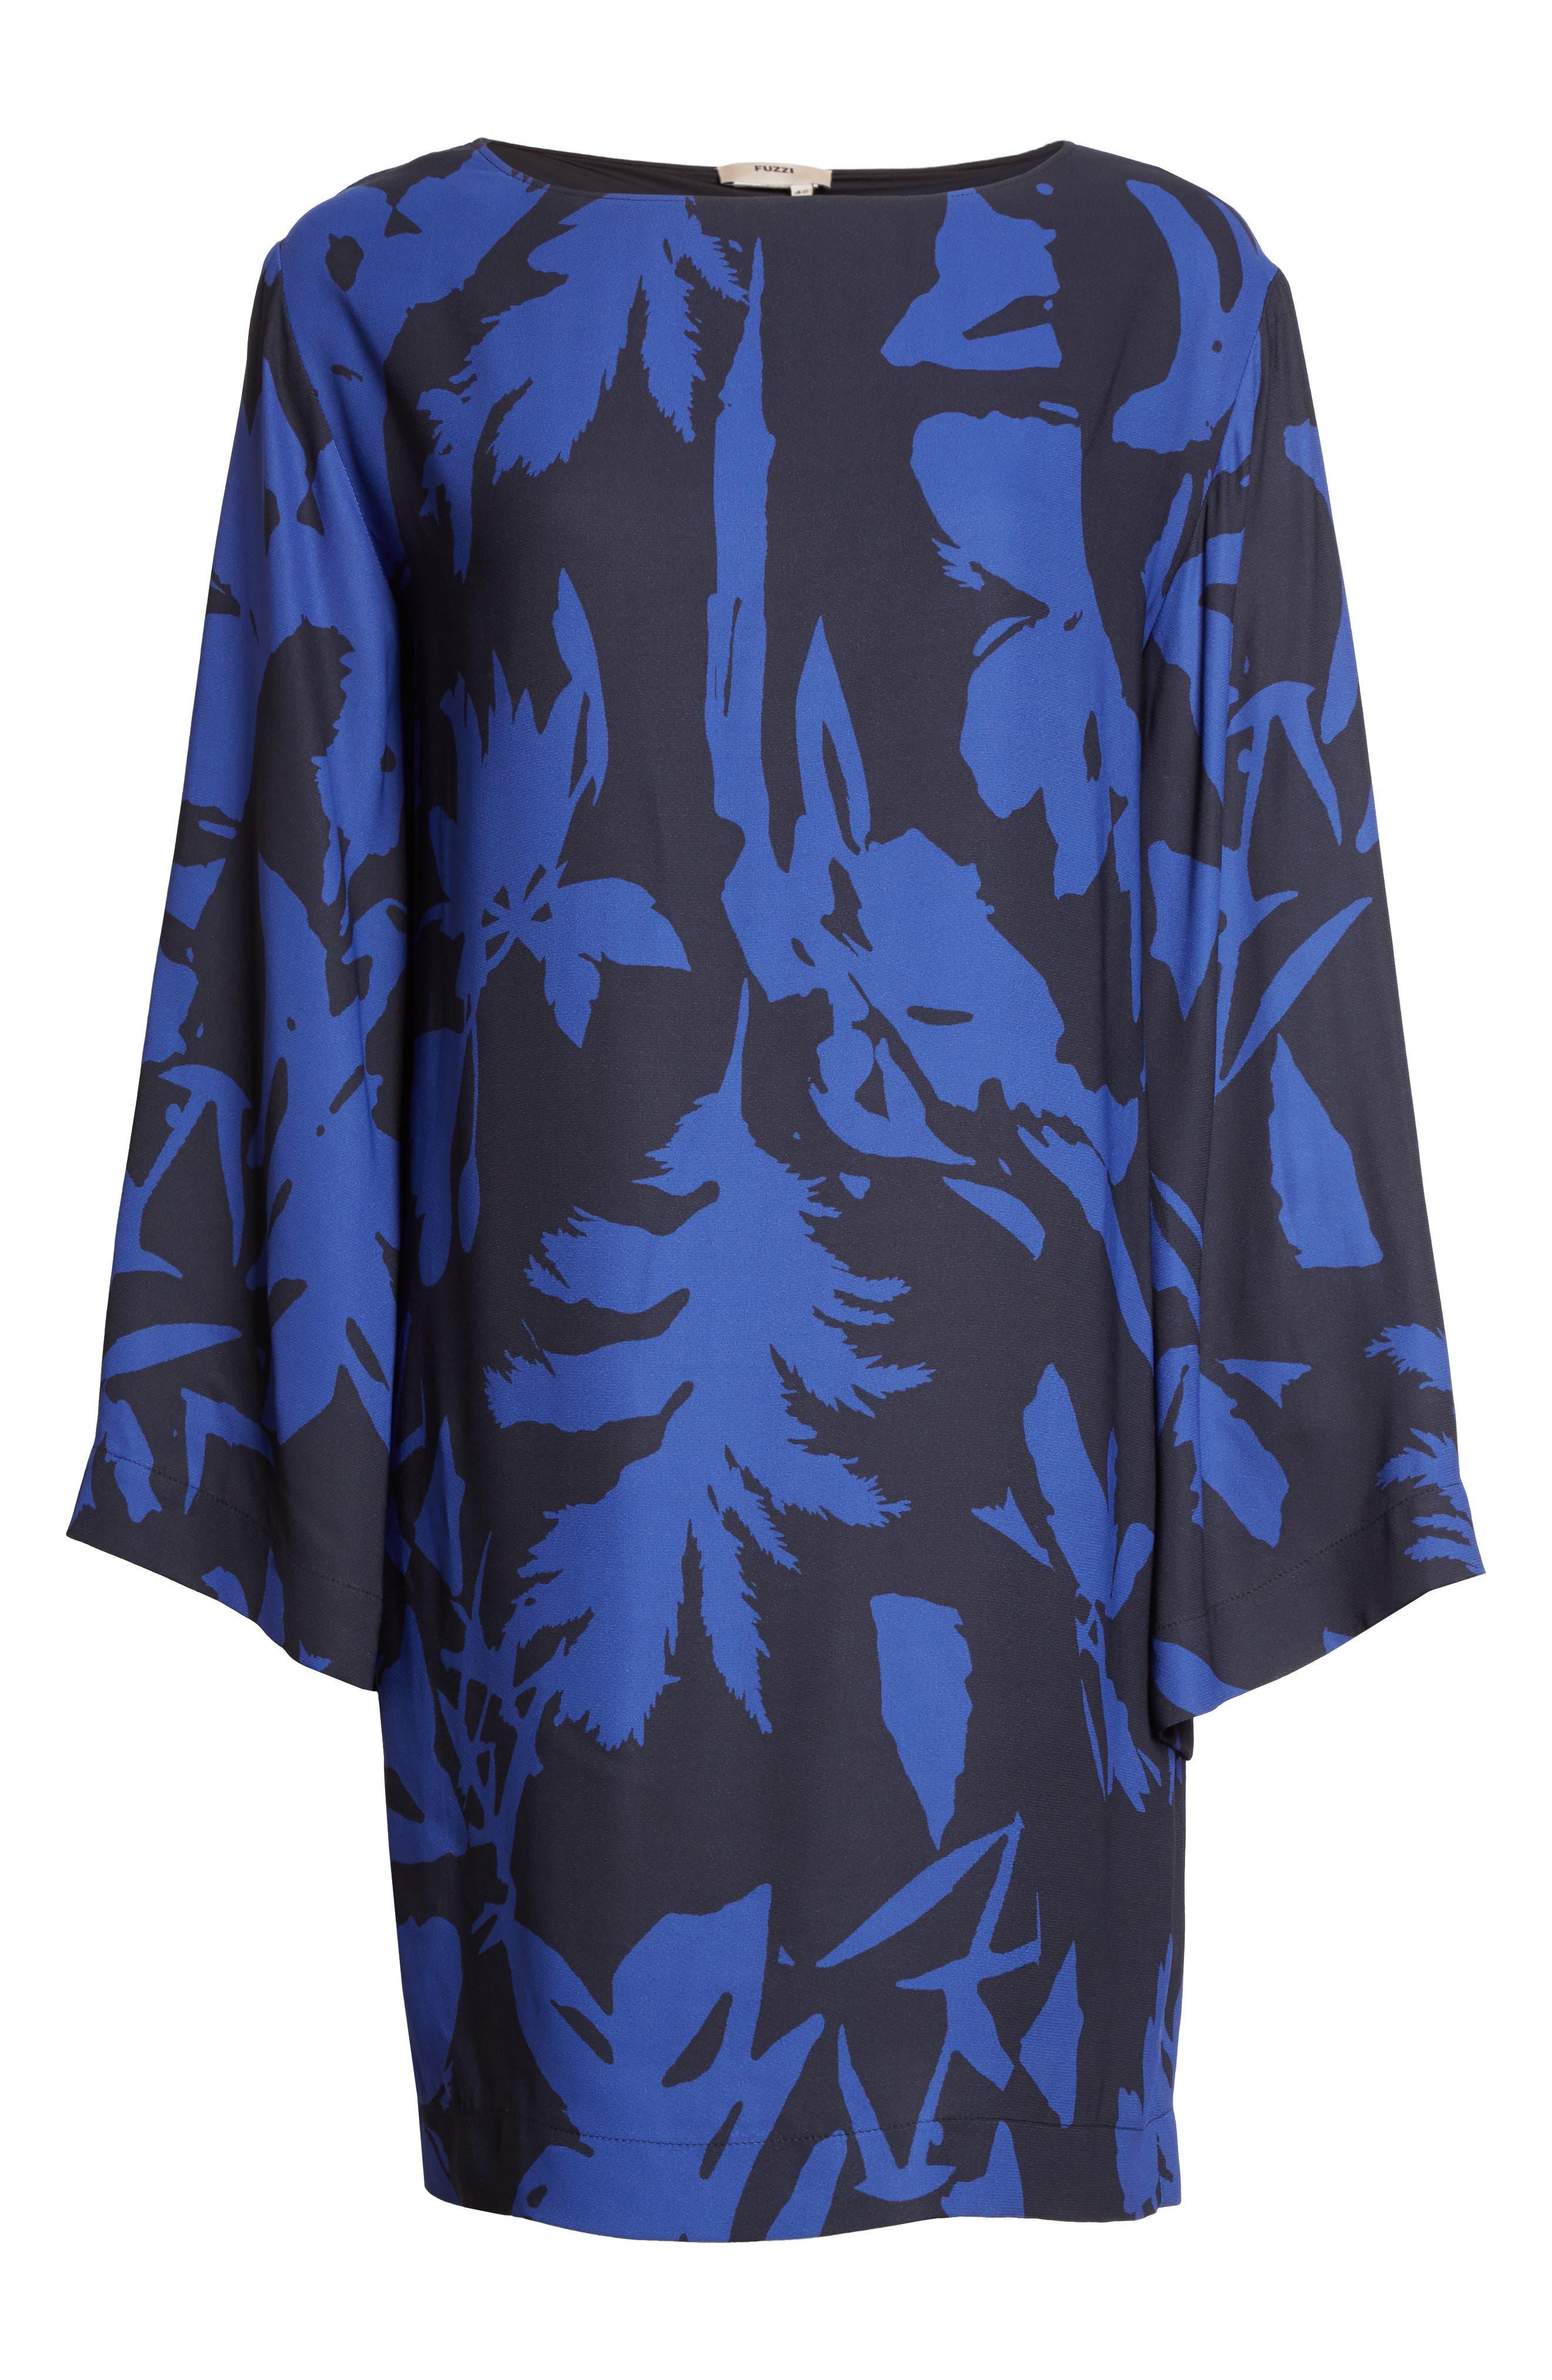 Floral Crepe Bell Sleeve Dress,                             Alternate thumbnail 6, color,                             410